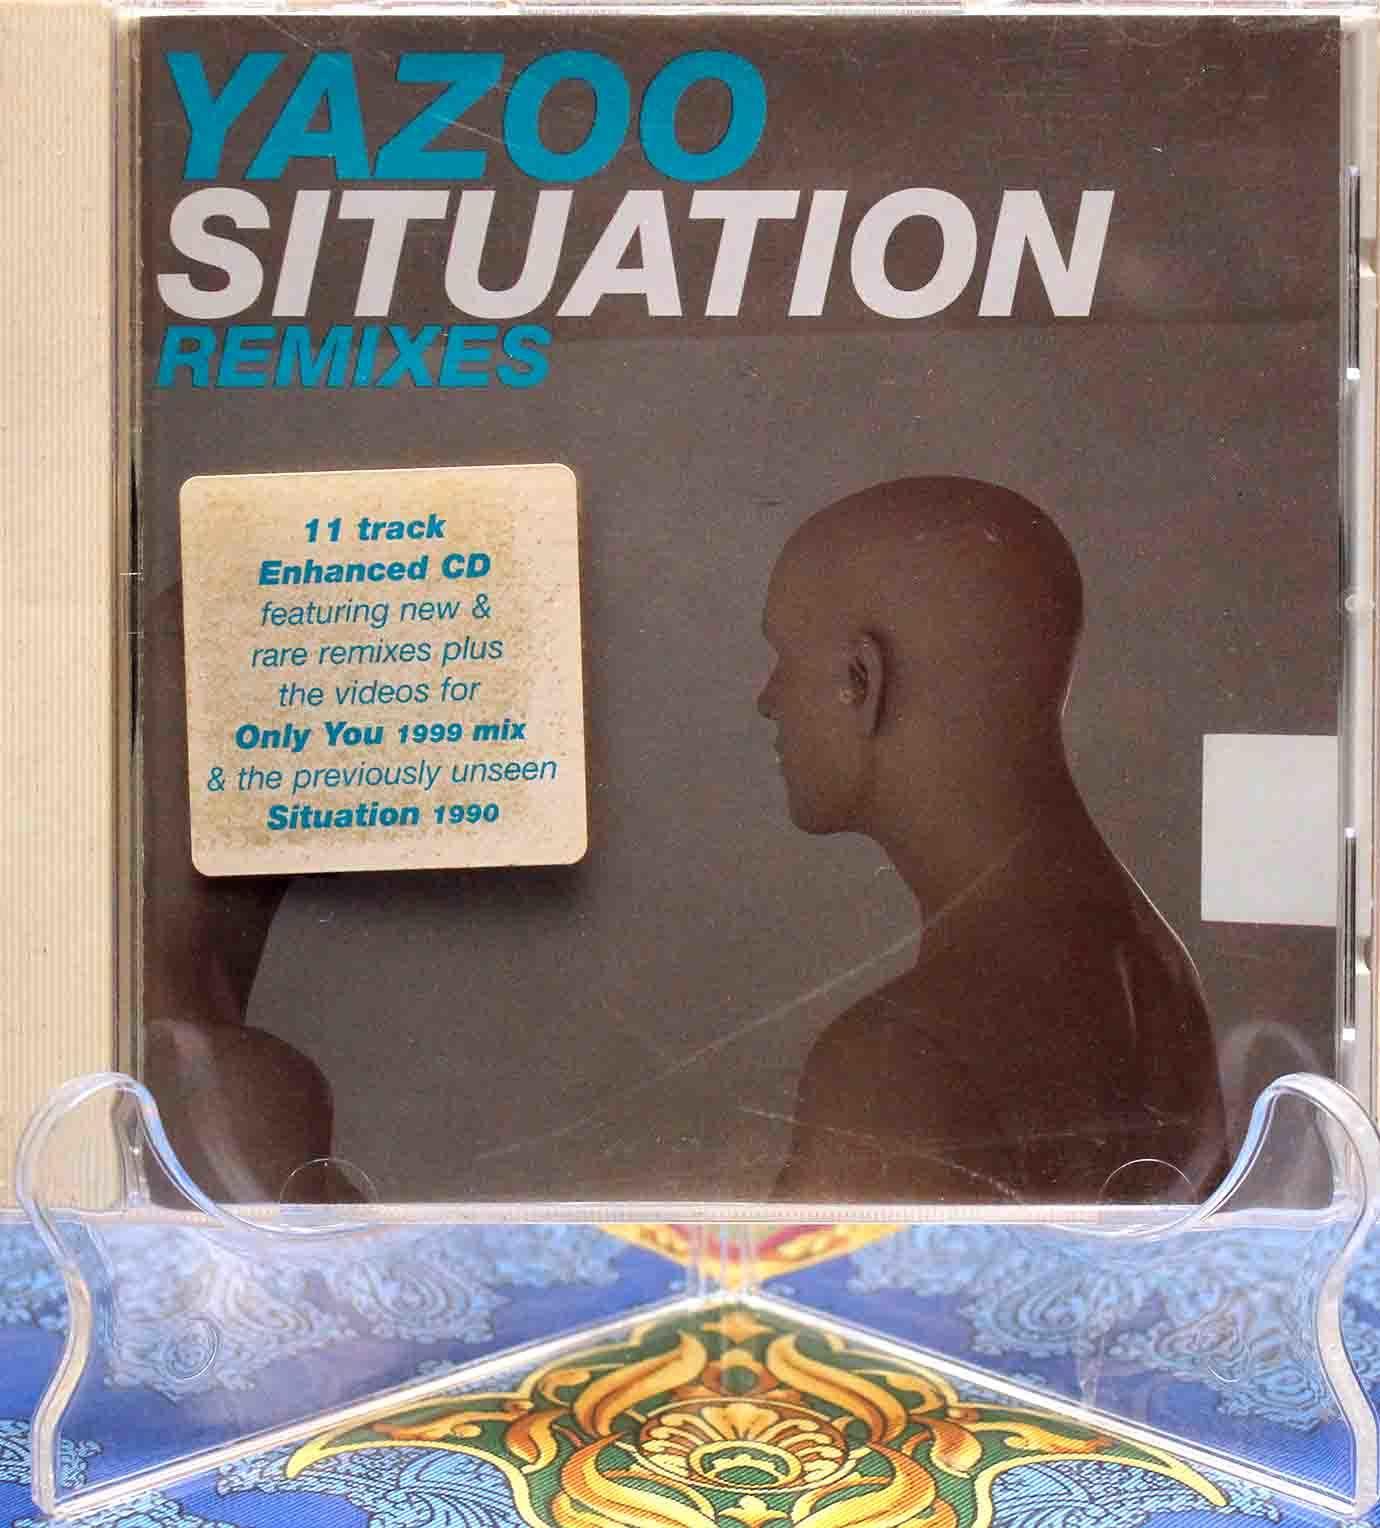 yazoo situation CD 01